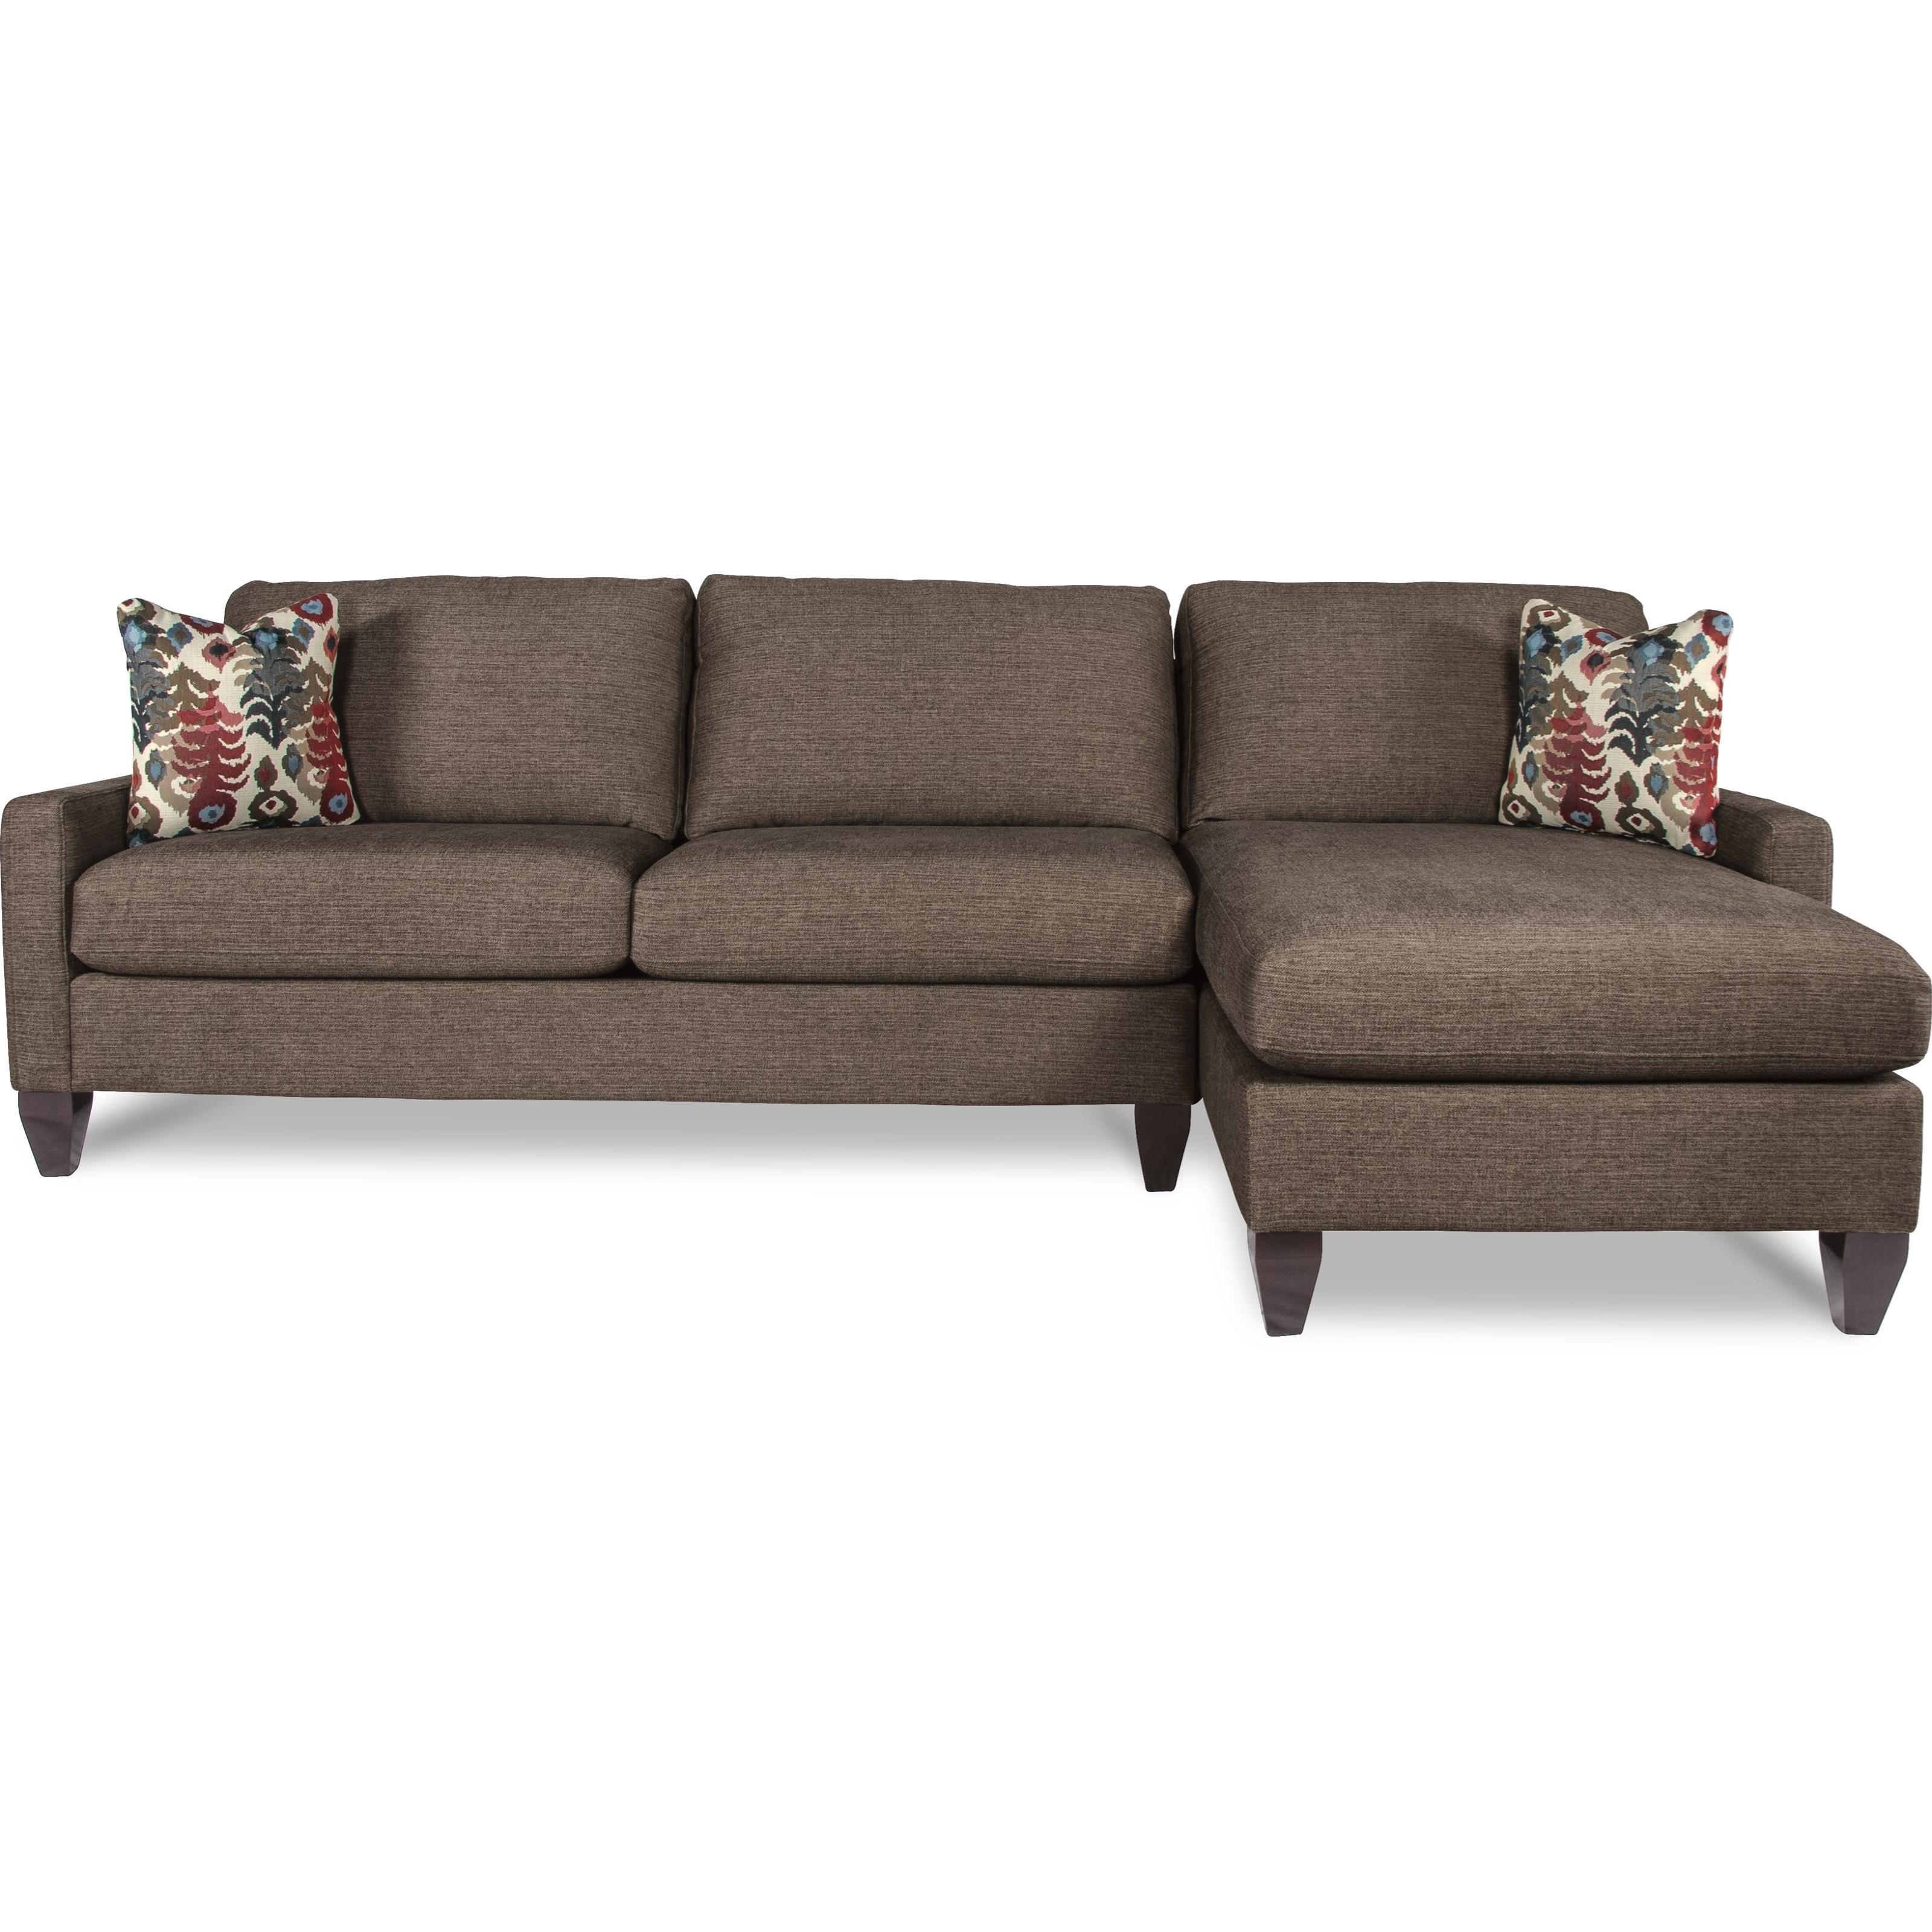 Perfect La Z Boy Studio2 Pc Sectional Sofa W/ RAF Chaise ...